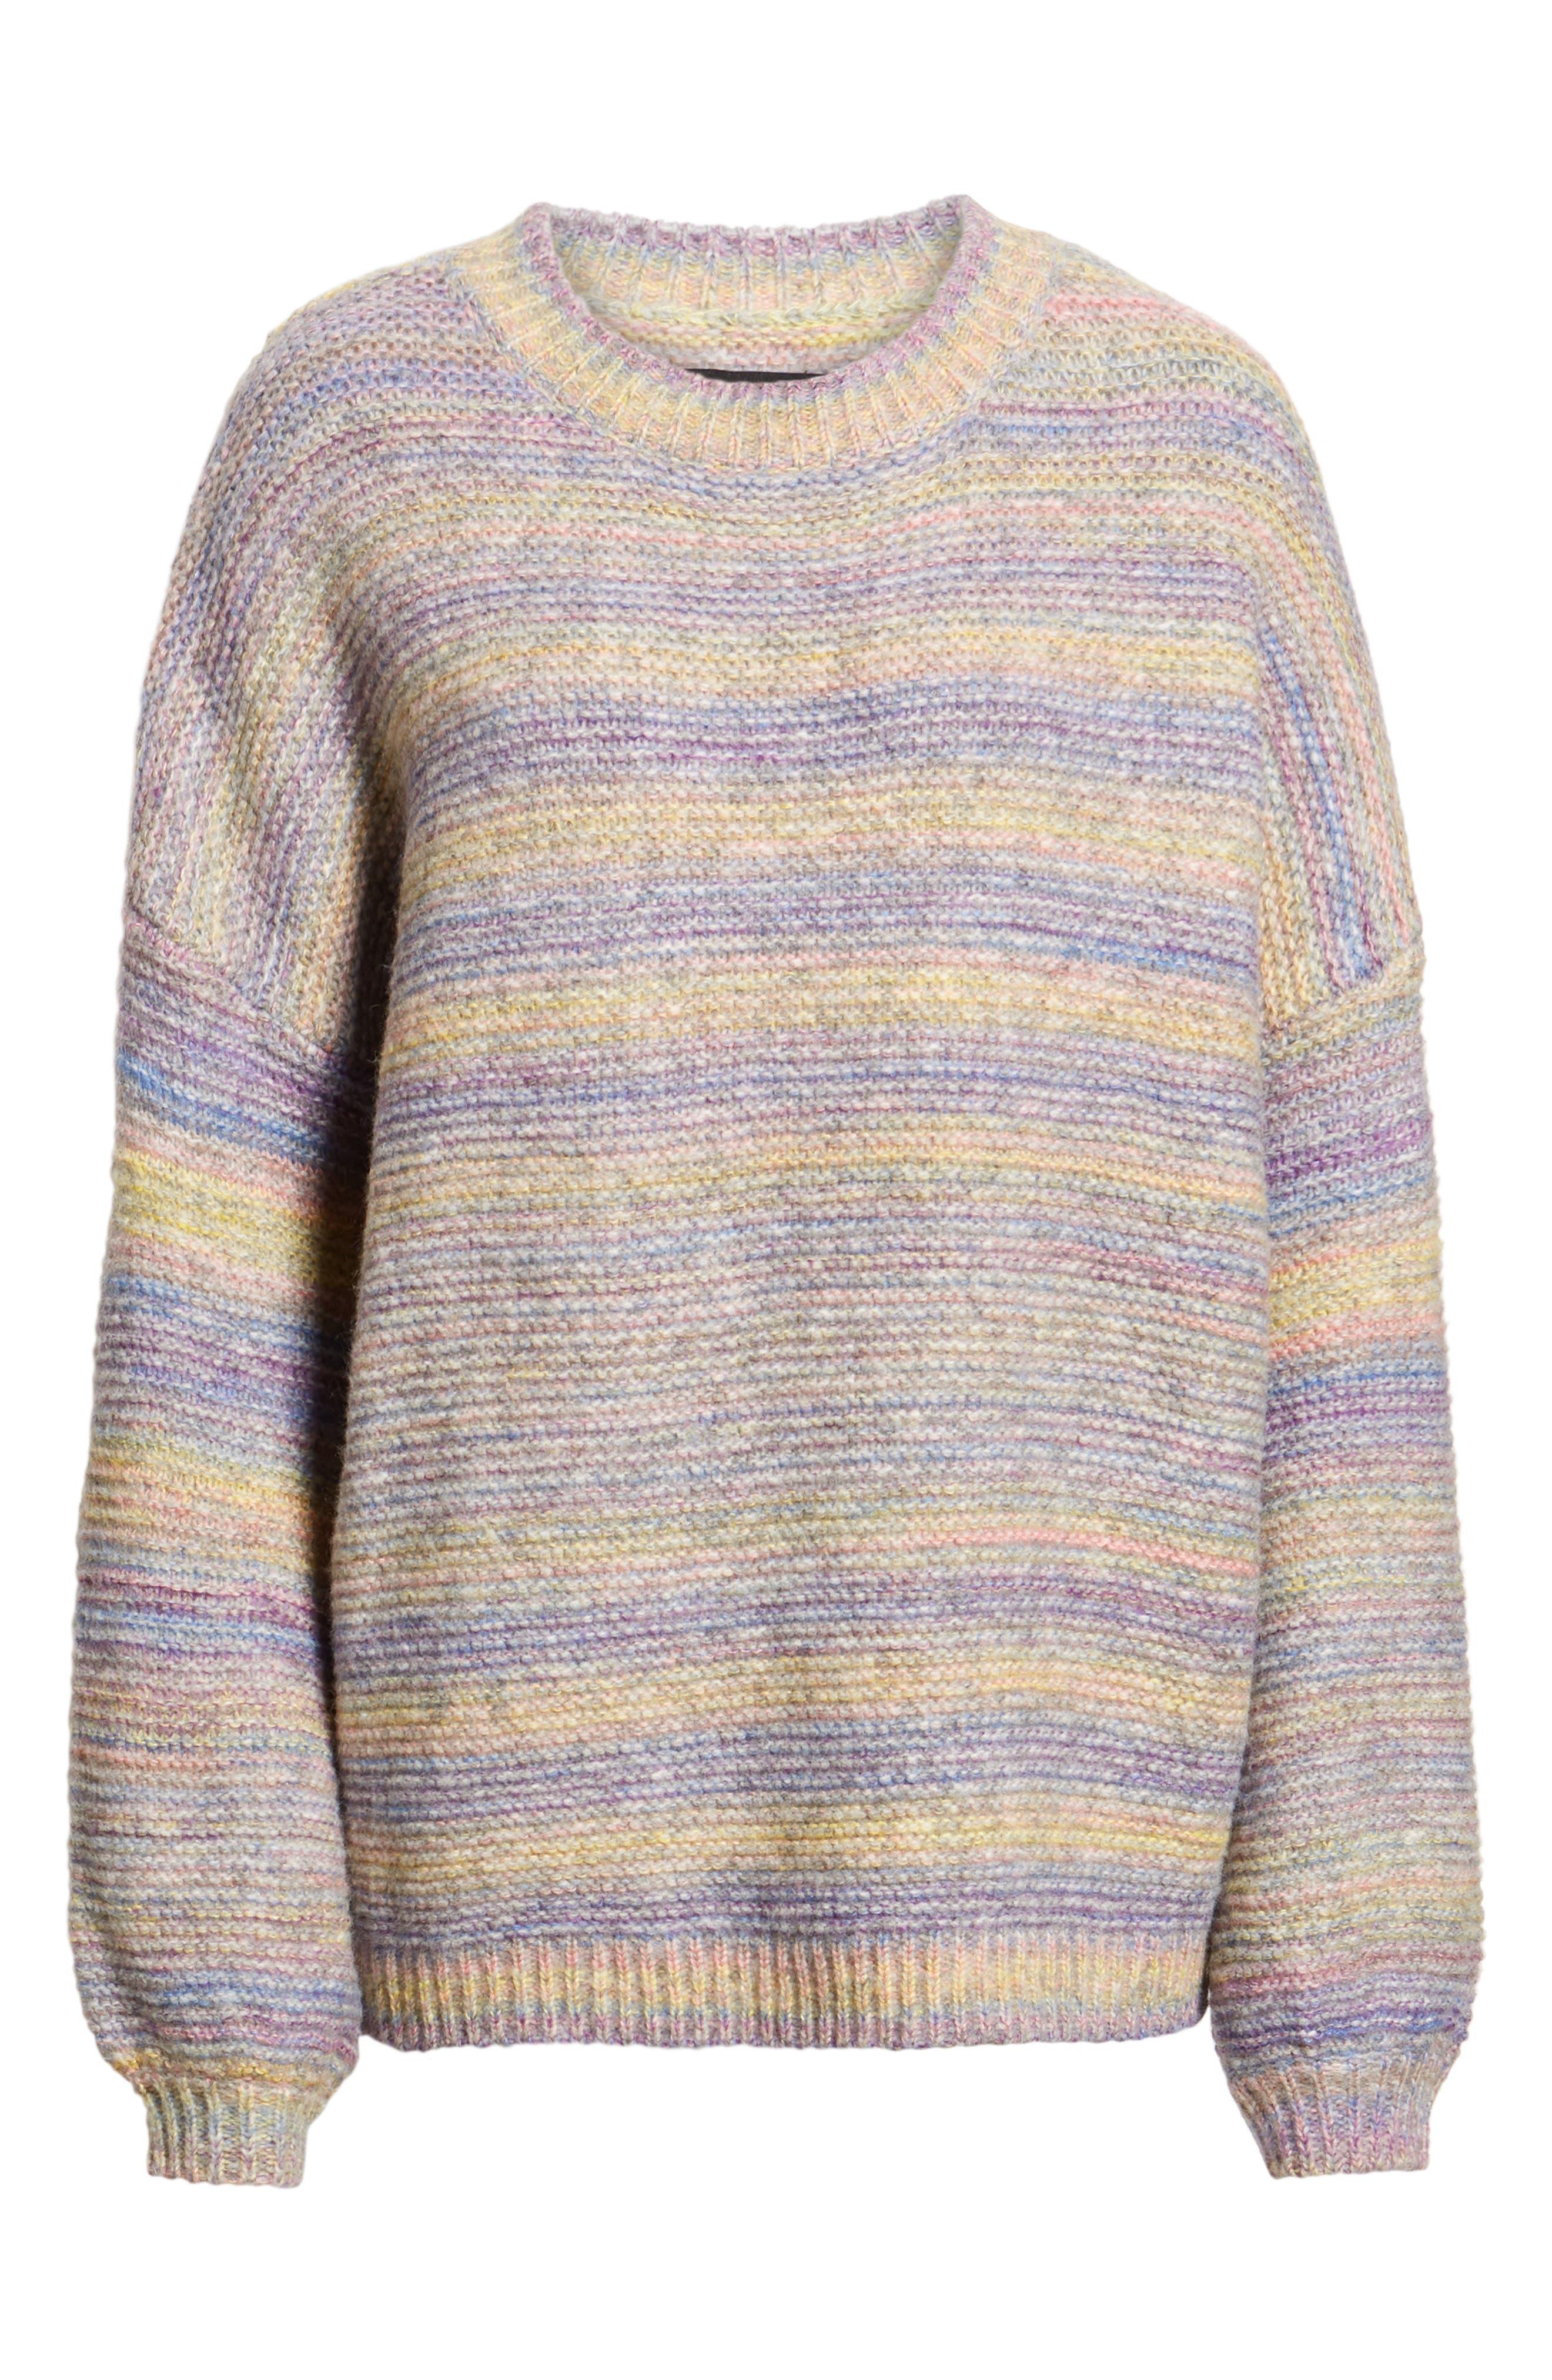 PROSPERITY DENIM, Rainbow Marl Sweater, Alternate thumbnail 6, color, YELLOW